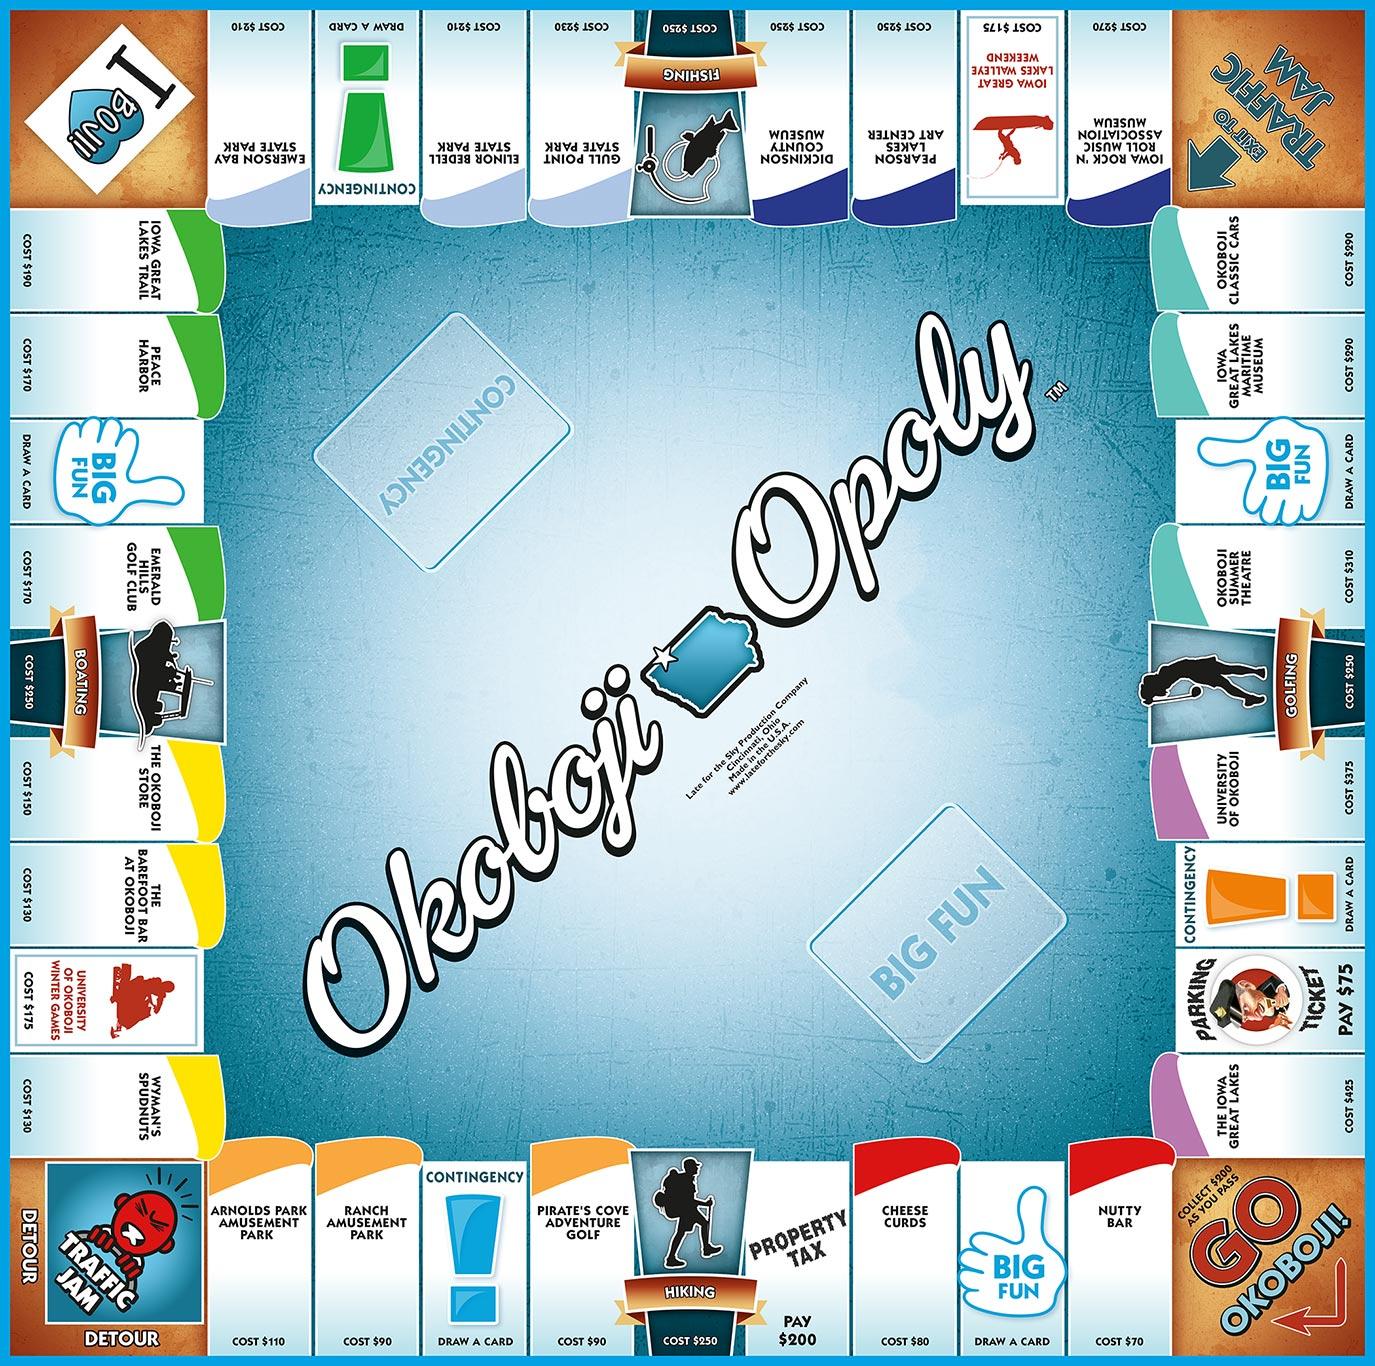 OKOBOJI-OPOLY Board Game